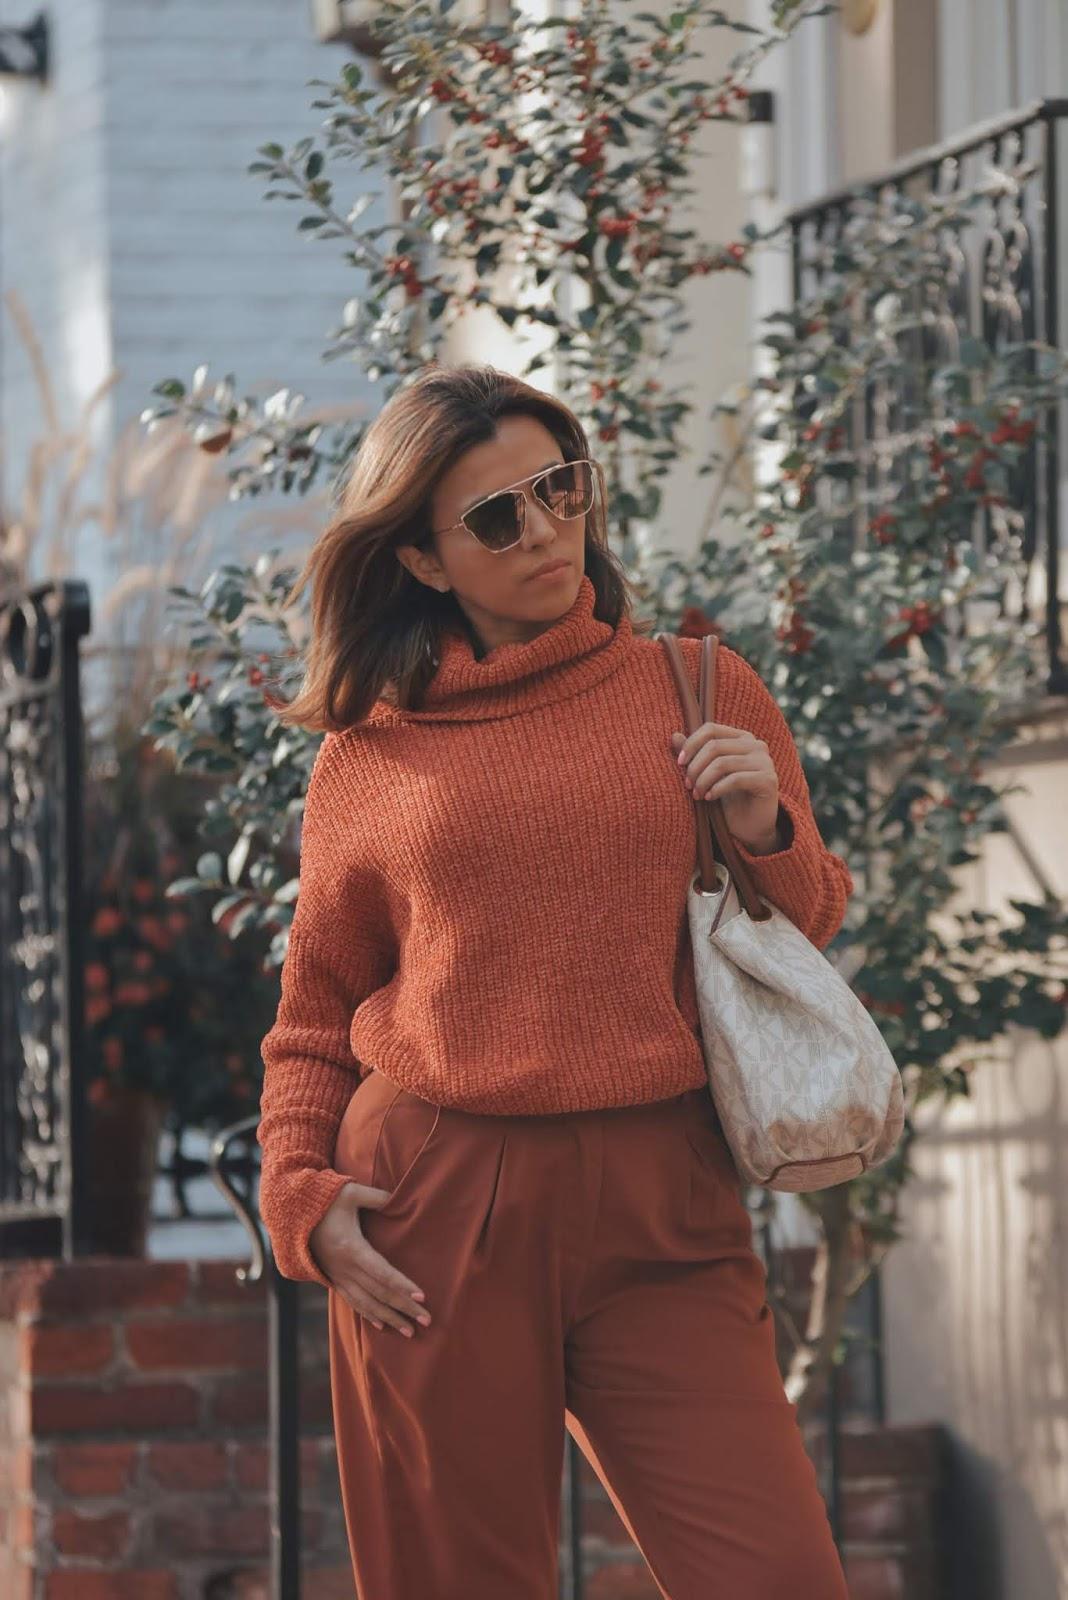 Rust Turtleneck Velvet Cable Knit Pullover Sweater-MariEstilo-DCBlogger-Youtuber de moda-fashionblog